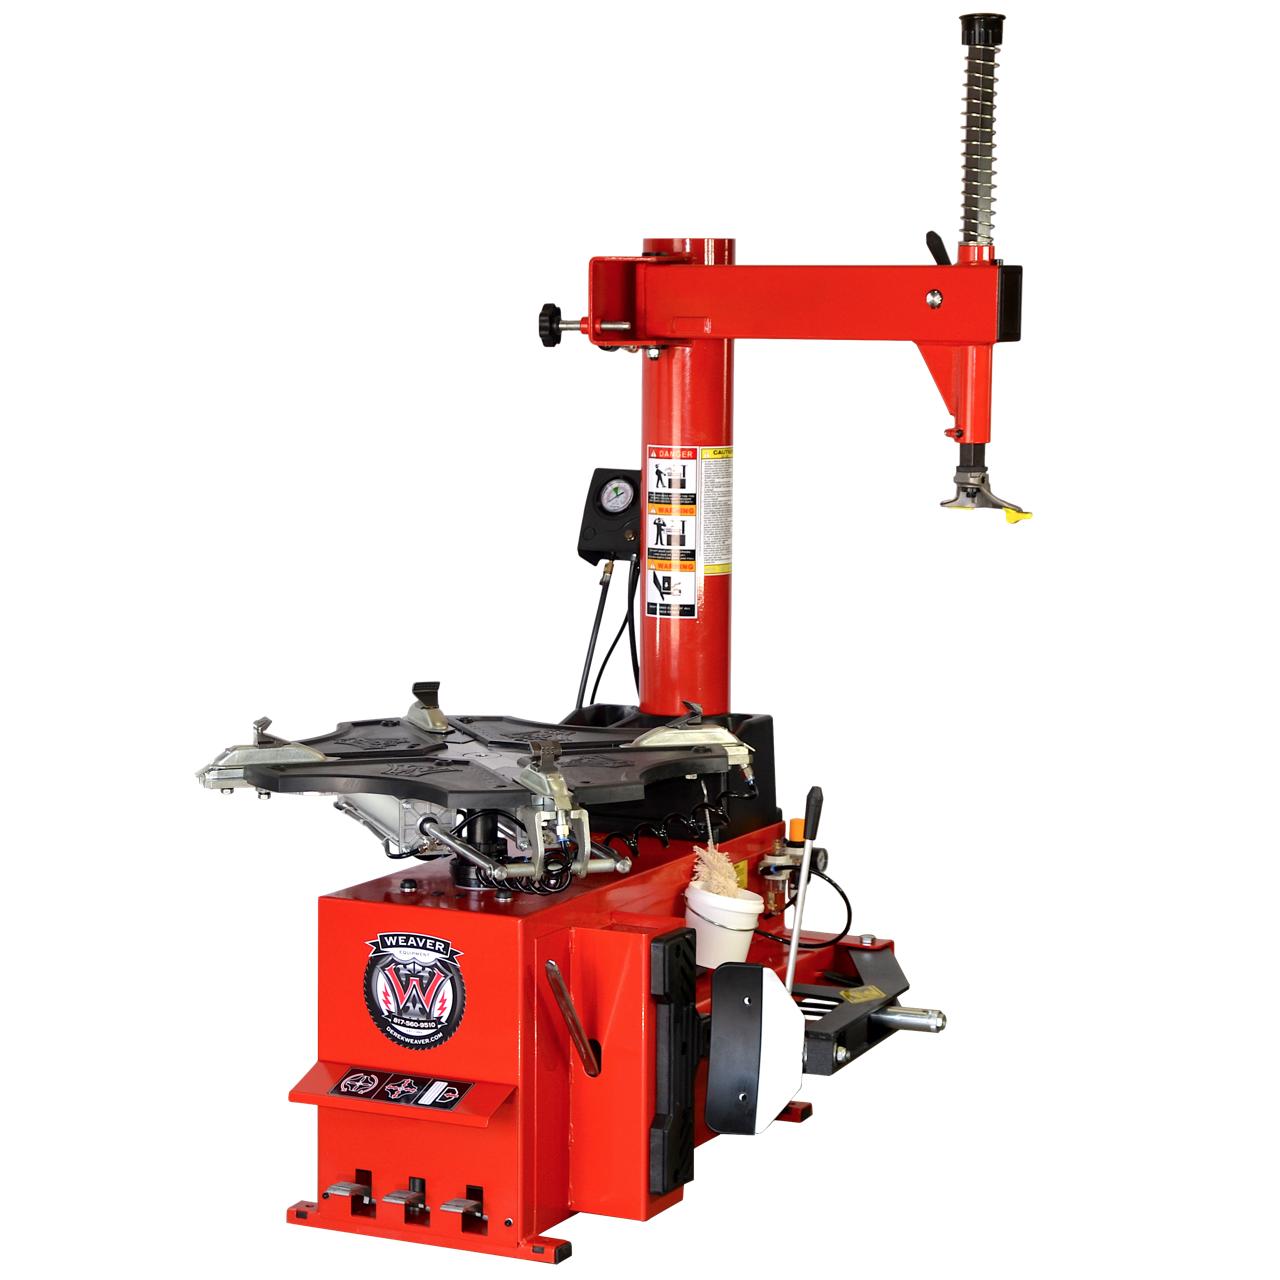 Weaver® W-898XS Tire Changer / Assist Arm Combo